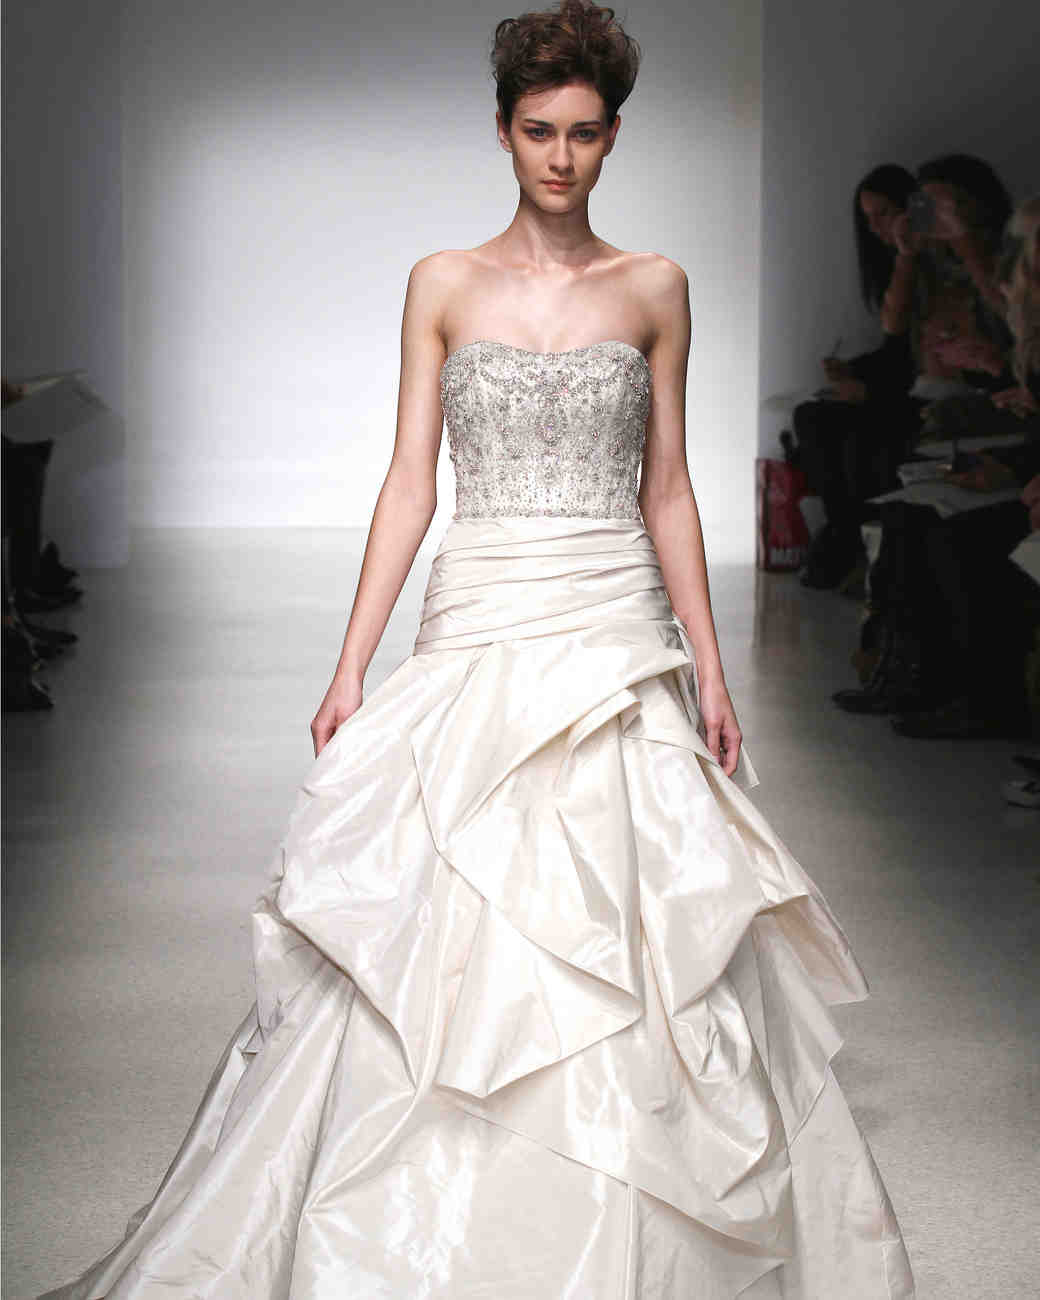 Wedding Dress Designers' Iconic Styles